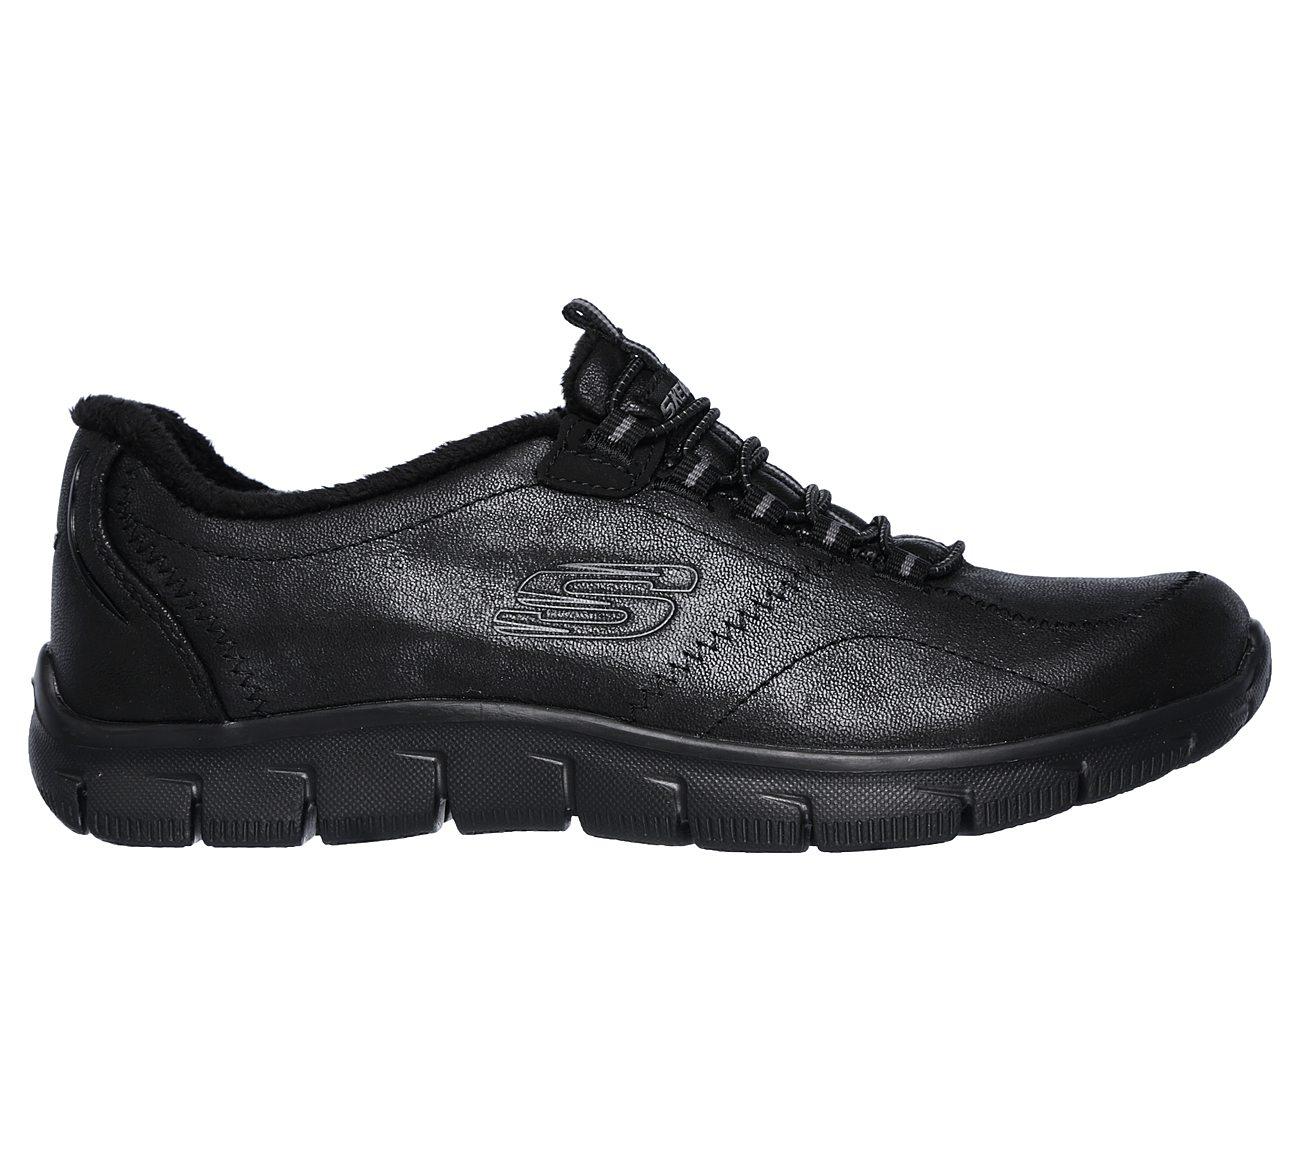 familia real celos influenza  Buy SKECHERS Relaxed Fit: Empire - Latest News SKECHERS Relaxed Fit Shoes